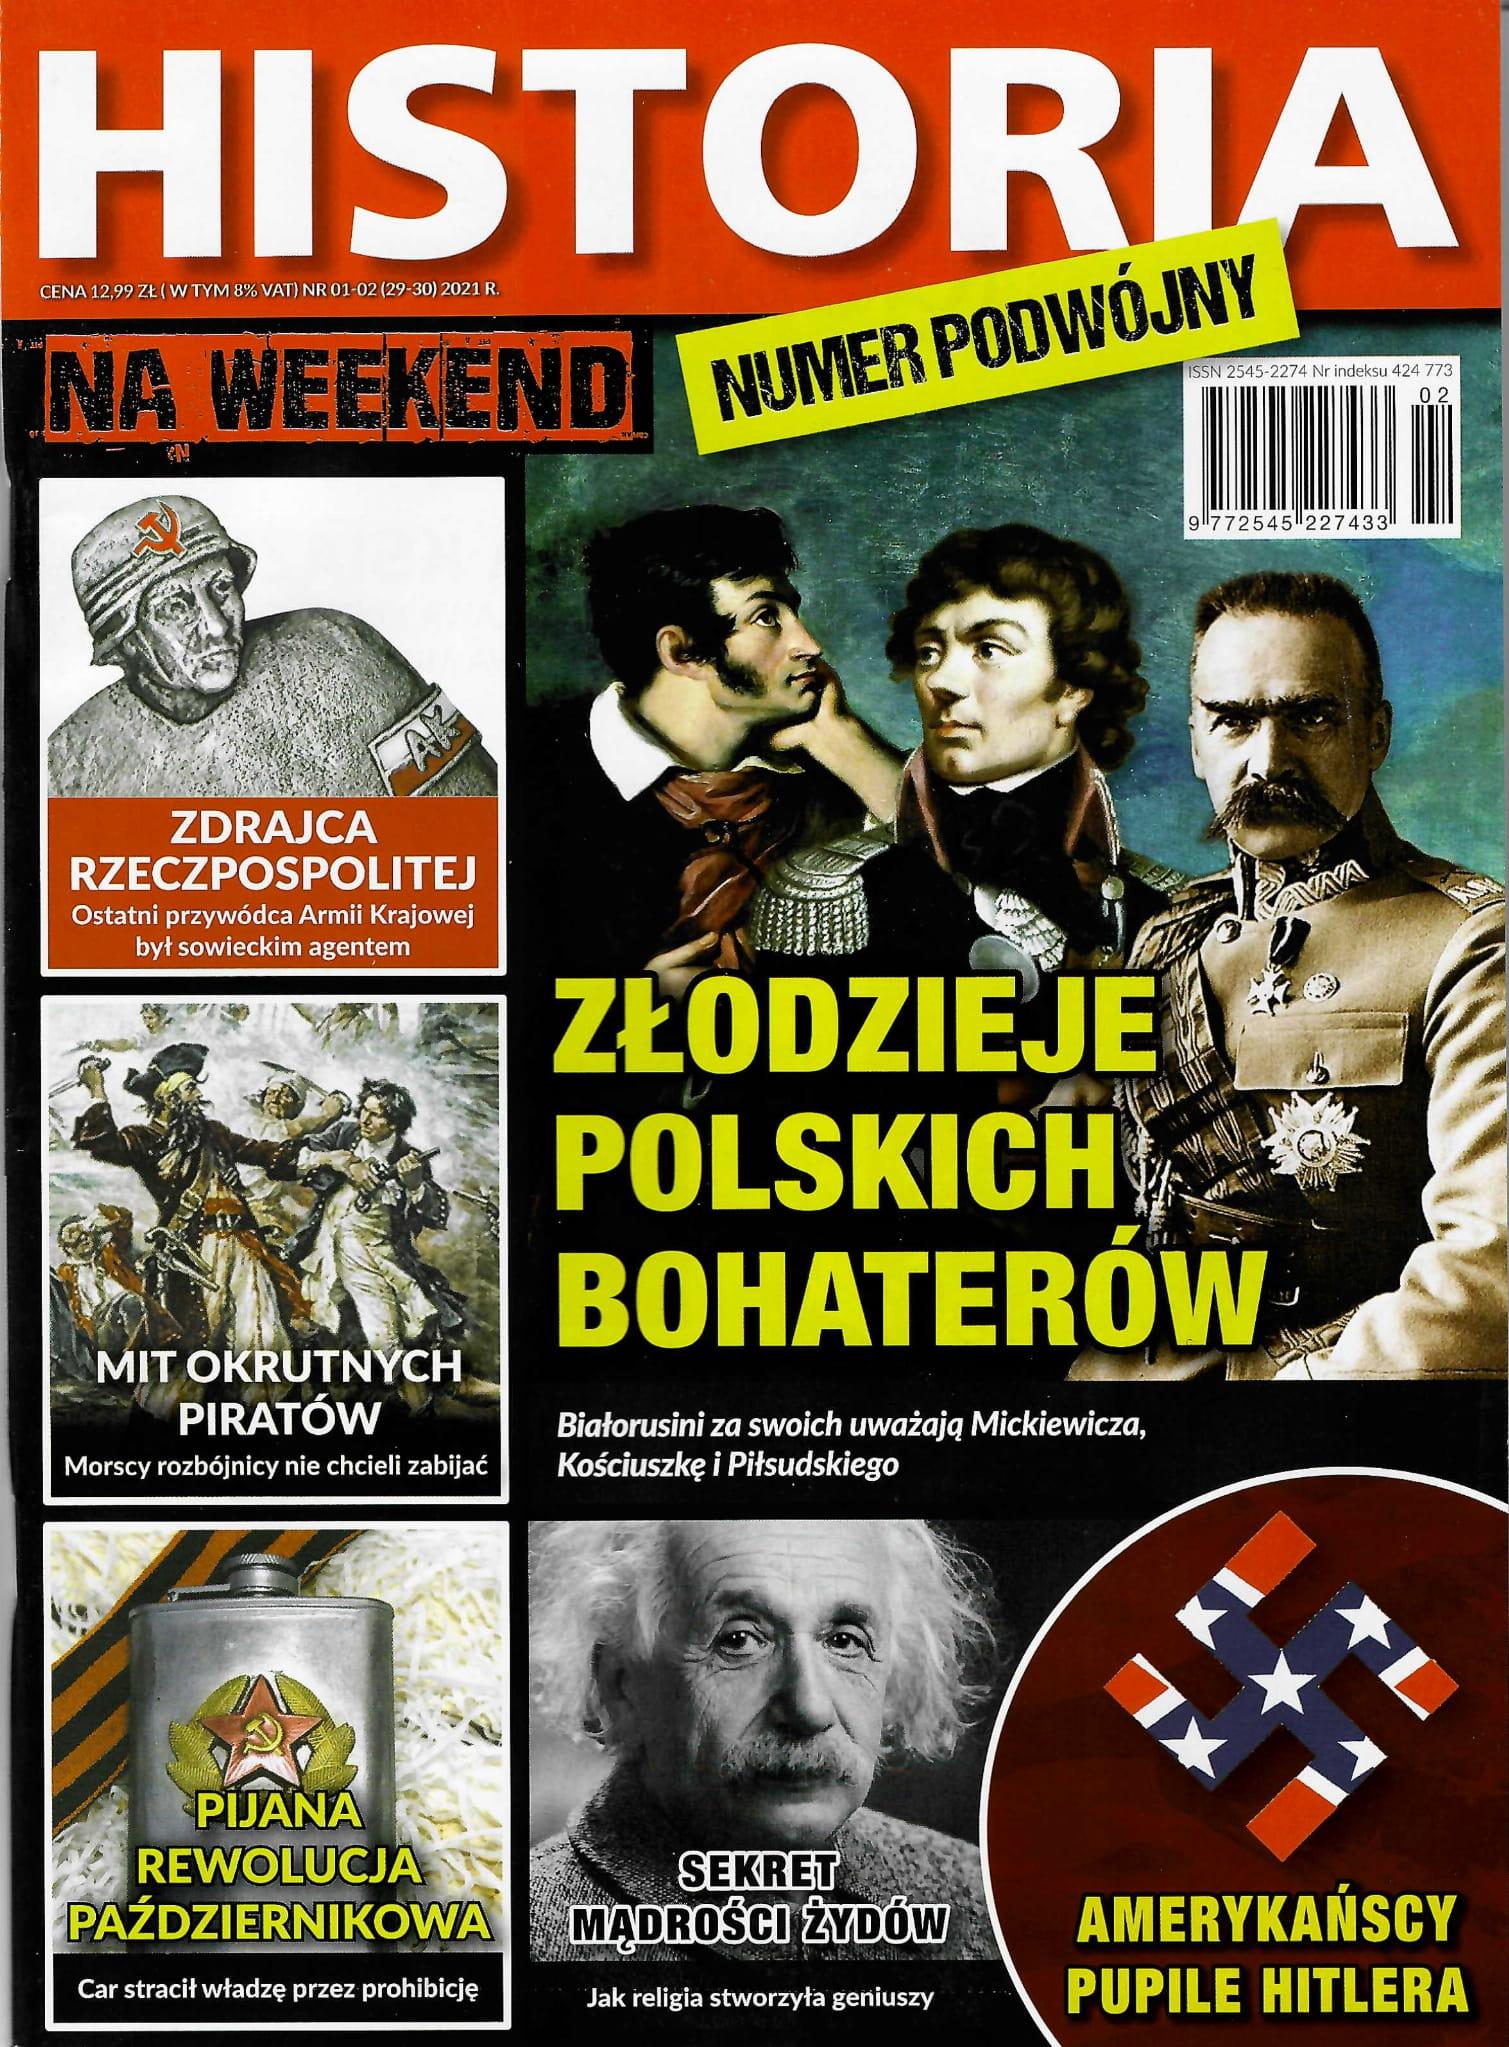 Historia na weekend nr 01-02 (29-30) 2021 r.